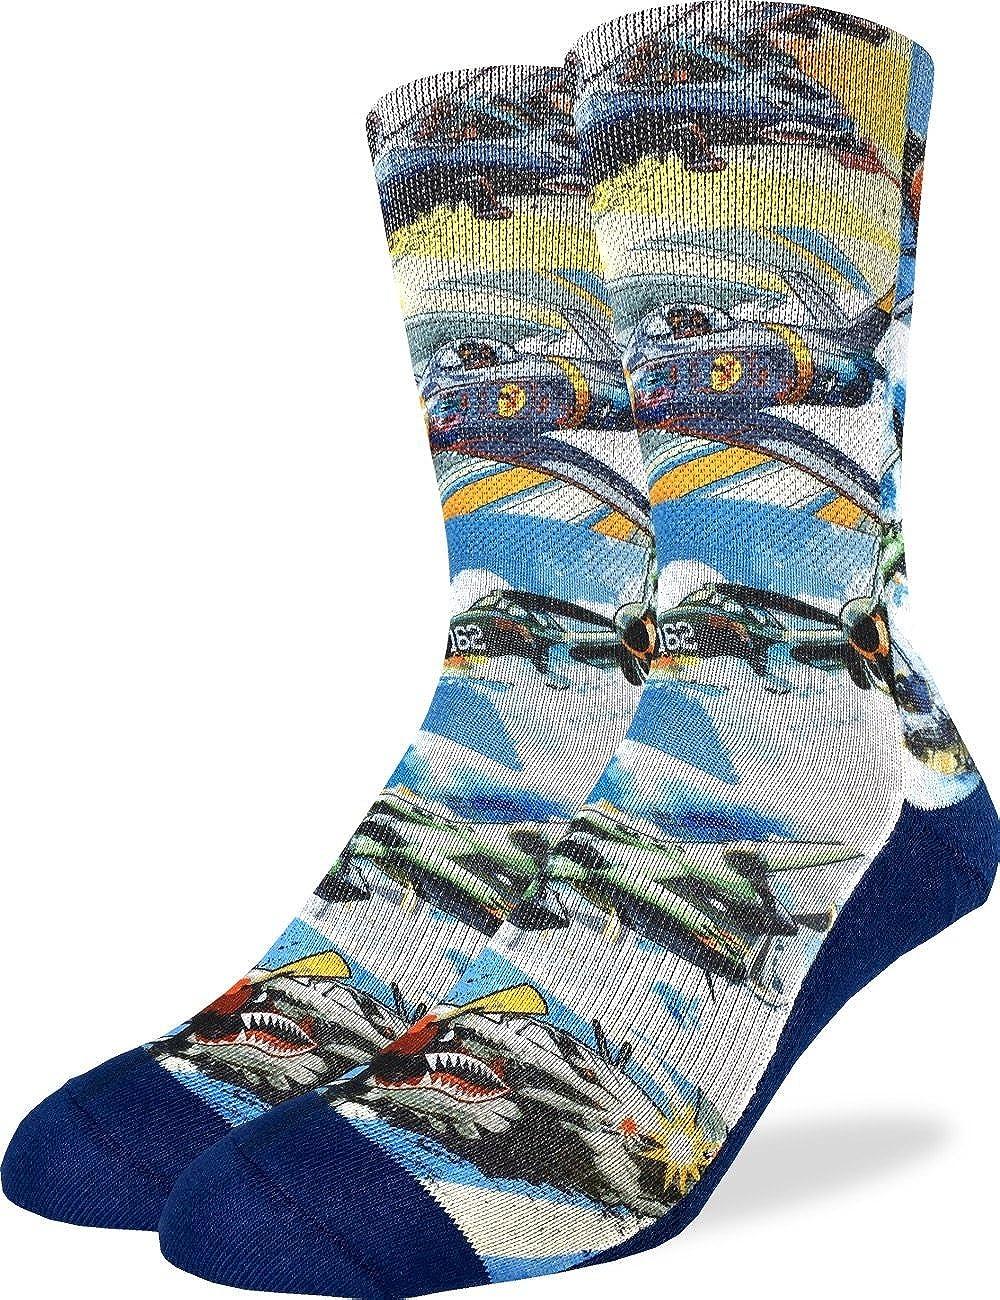 Good Luck Sock Men's Fighter Jet Crew Socks - Blue, Adult Shoe Size 8-13 4100